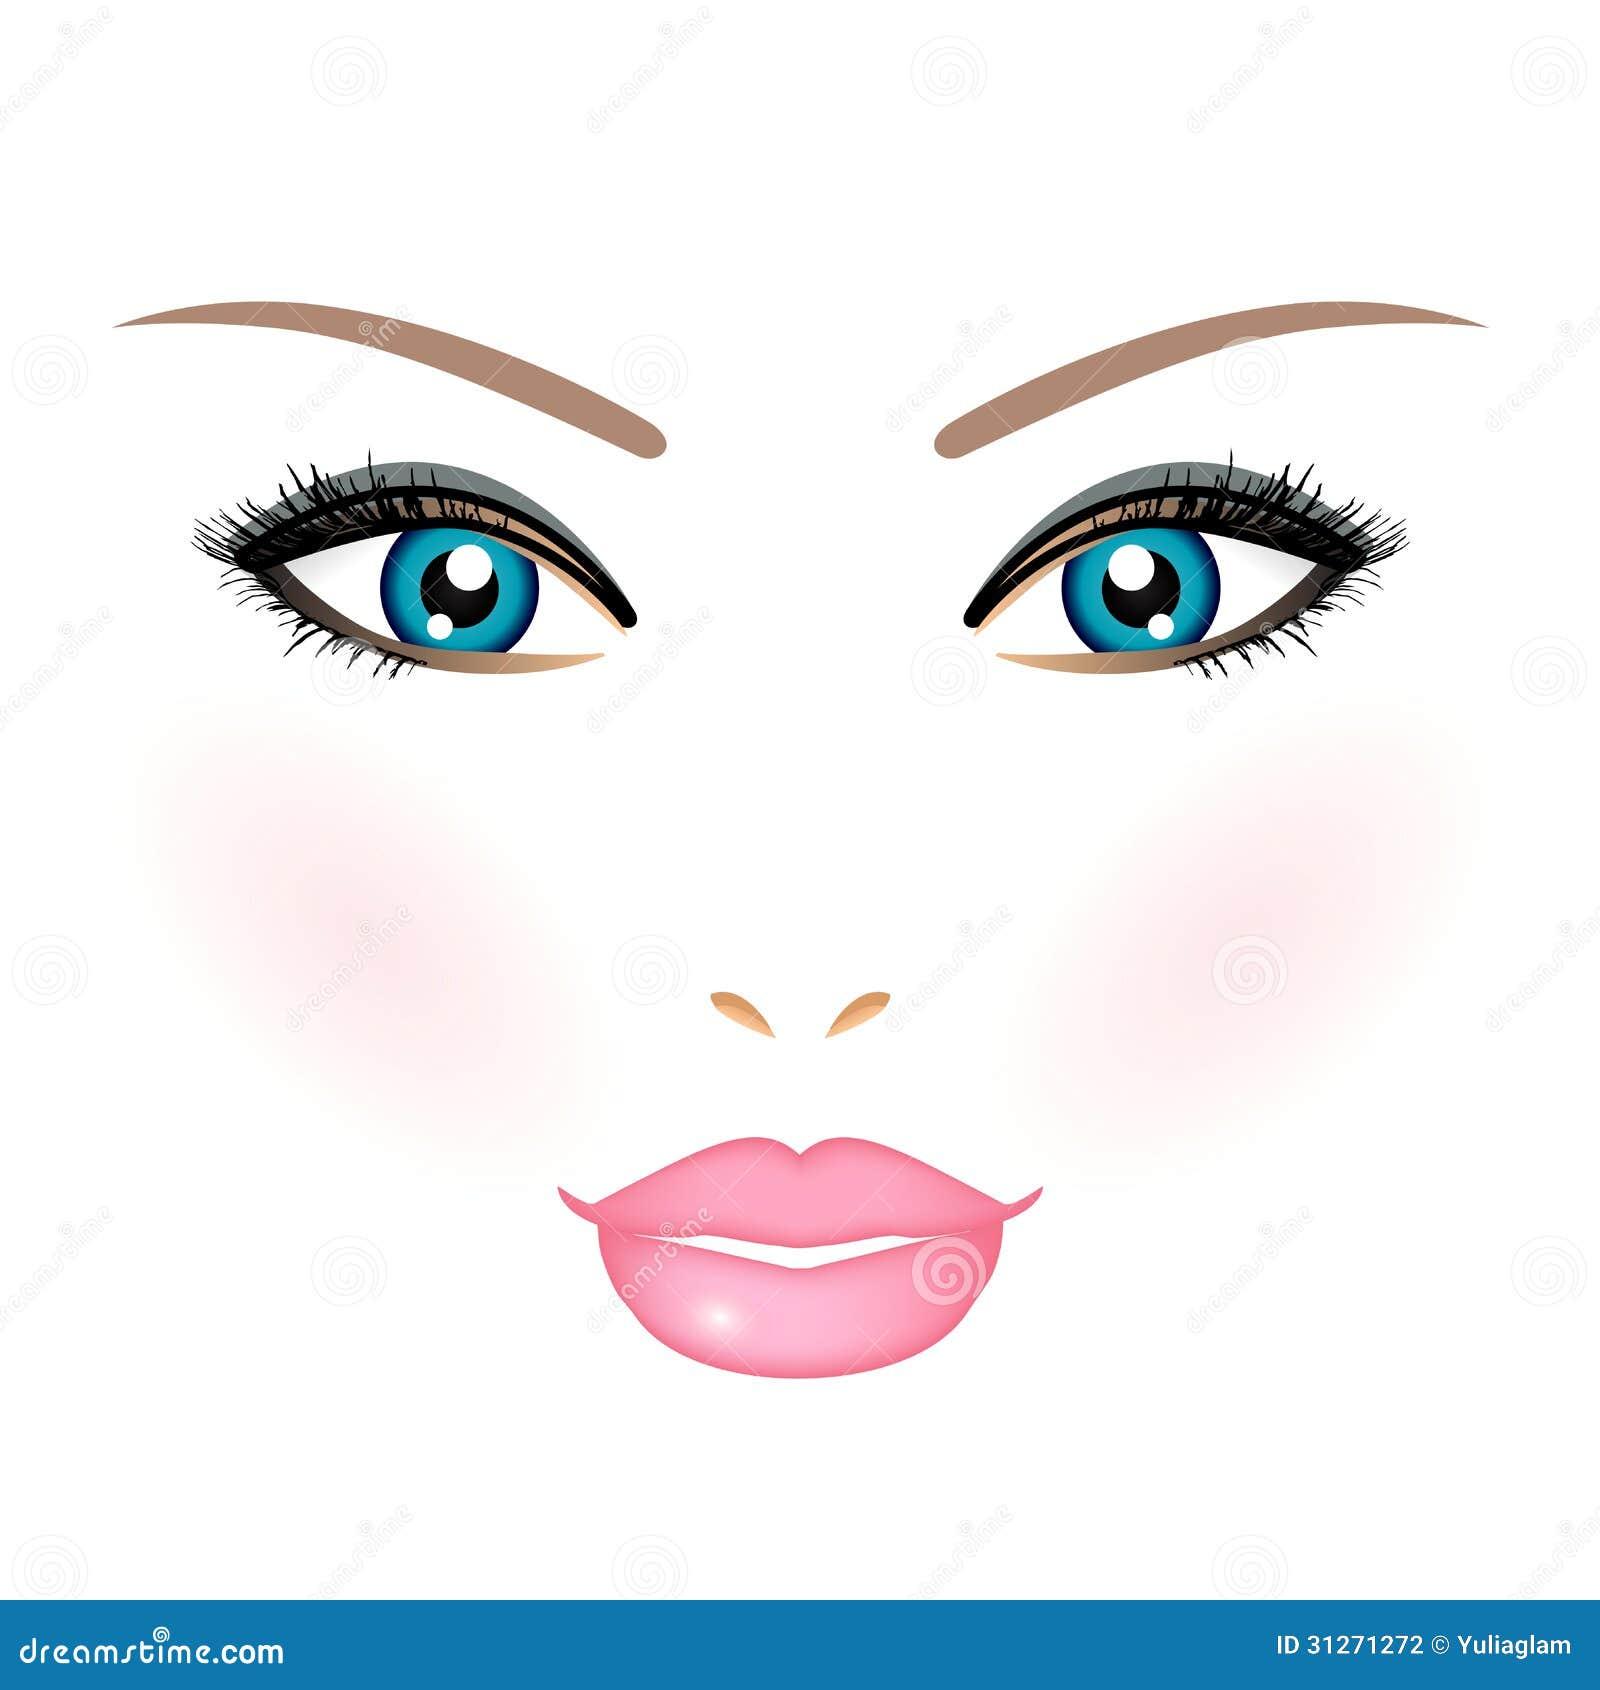 Woman Face Stock Vector. Illustration Of Artist, Eyelashes